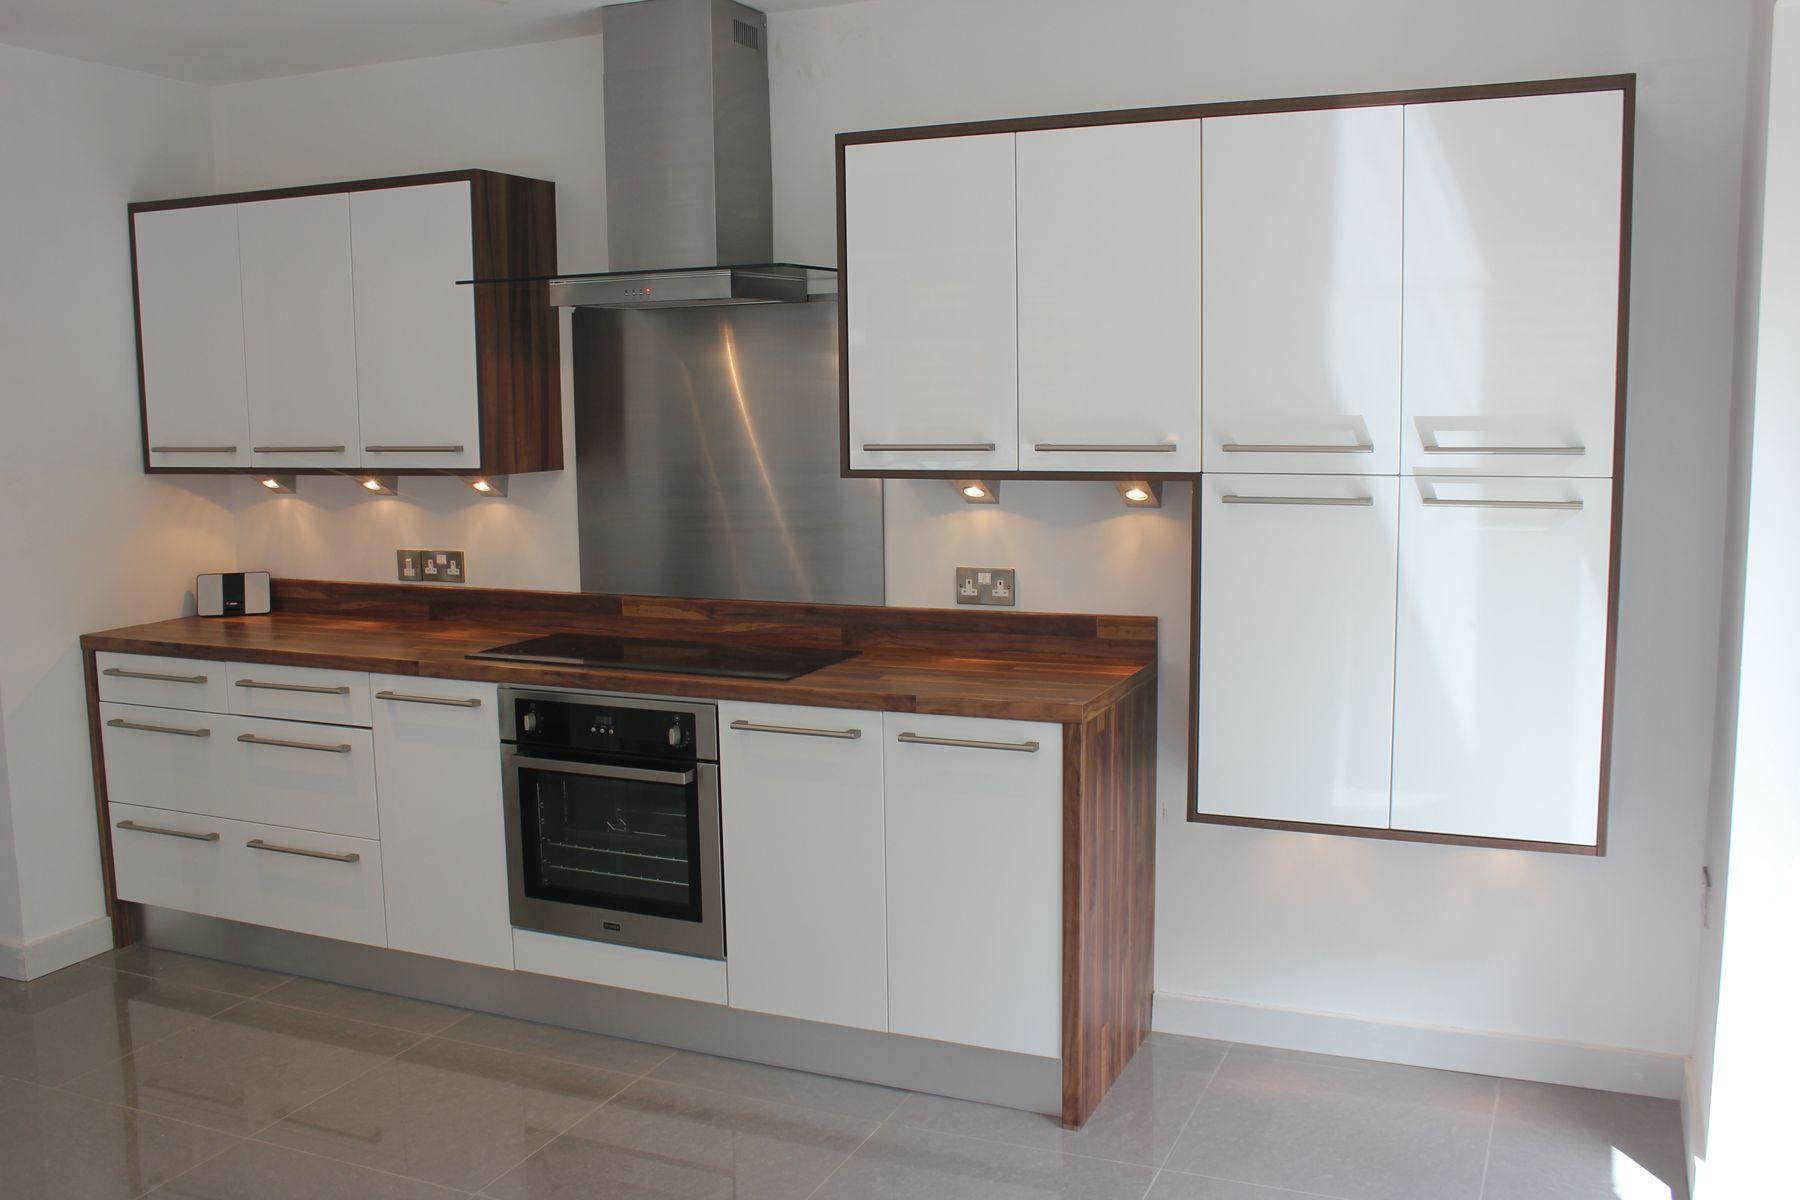 White Gloss Kitchen With Wood Wrap Around Wooden